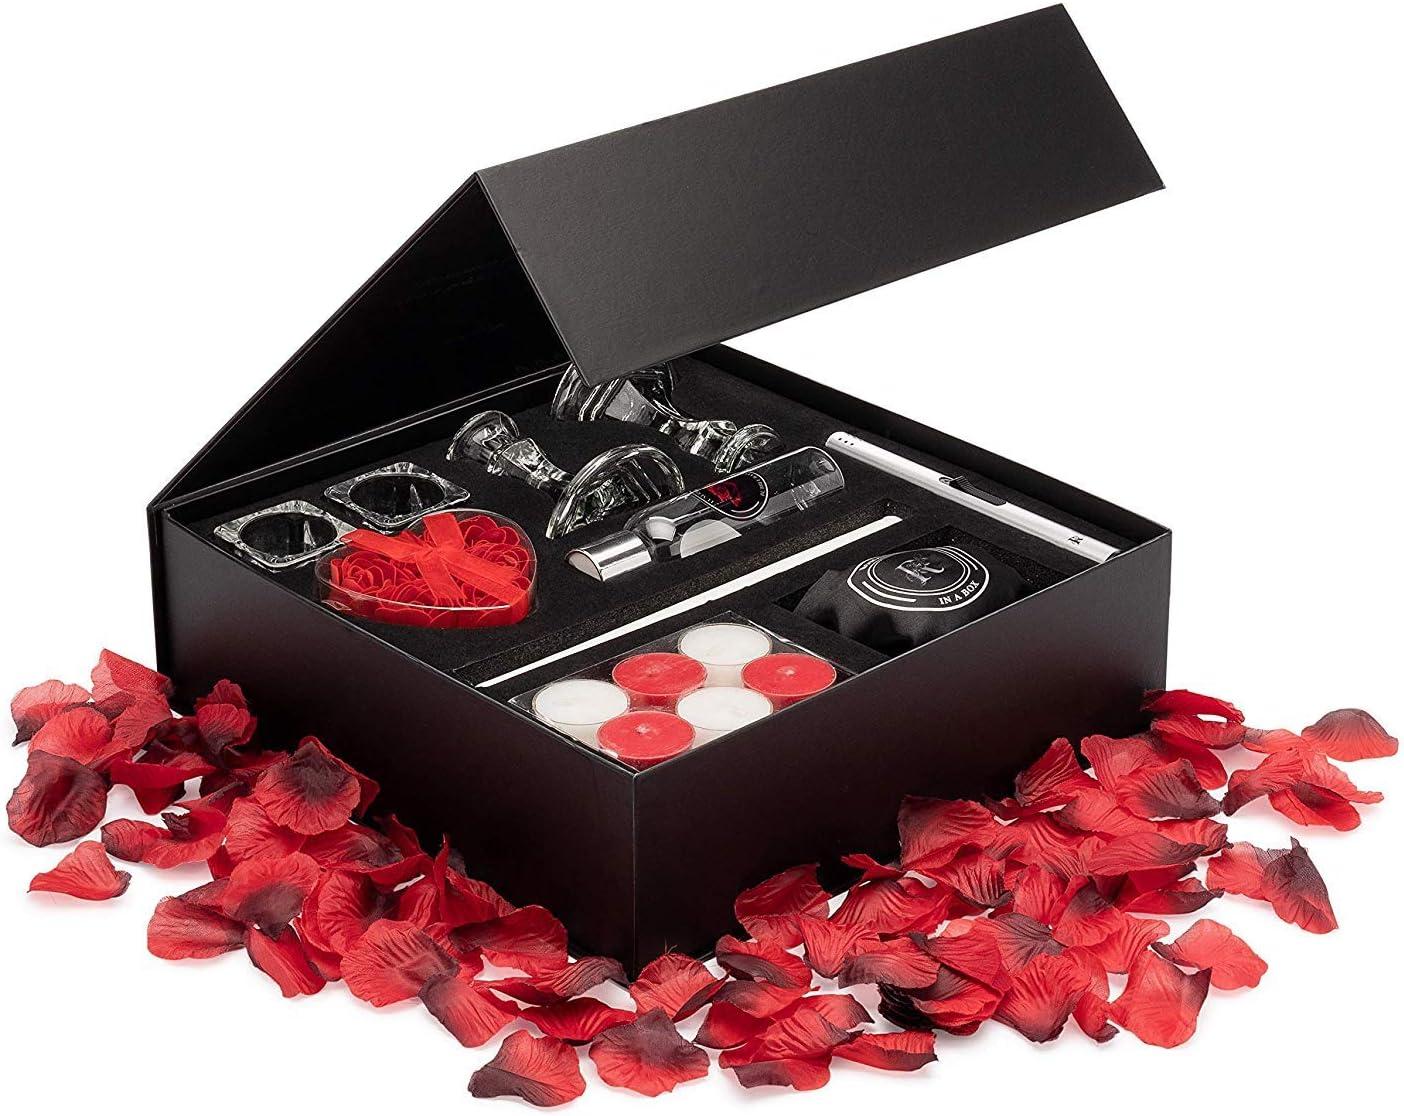 Romance in a box